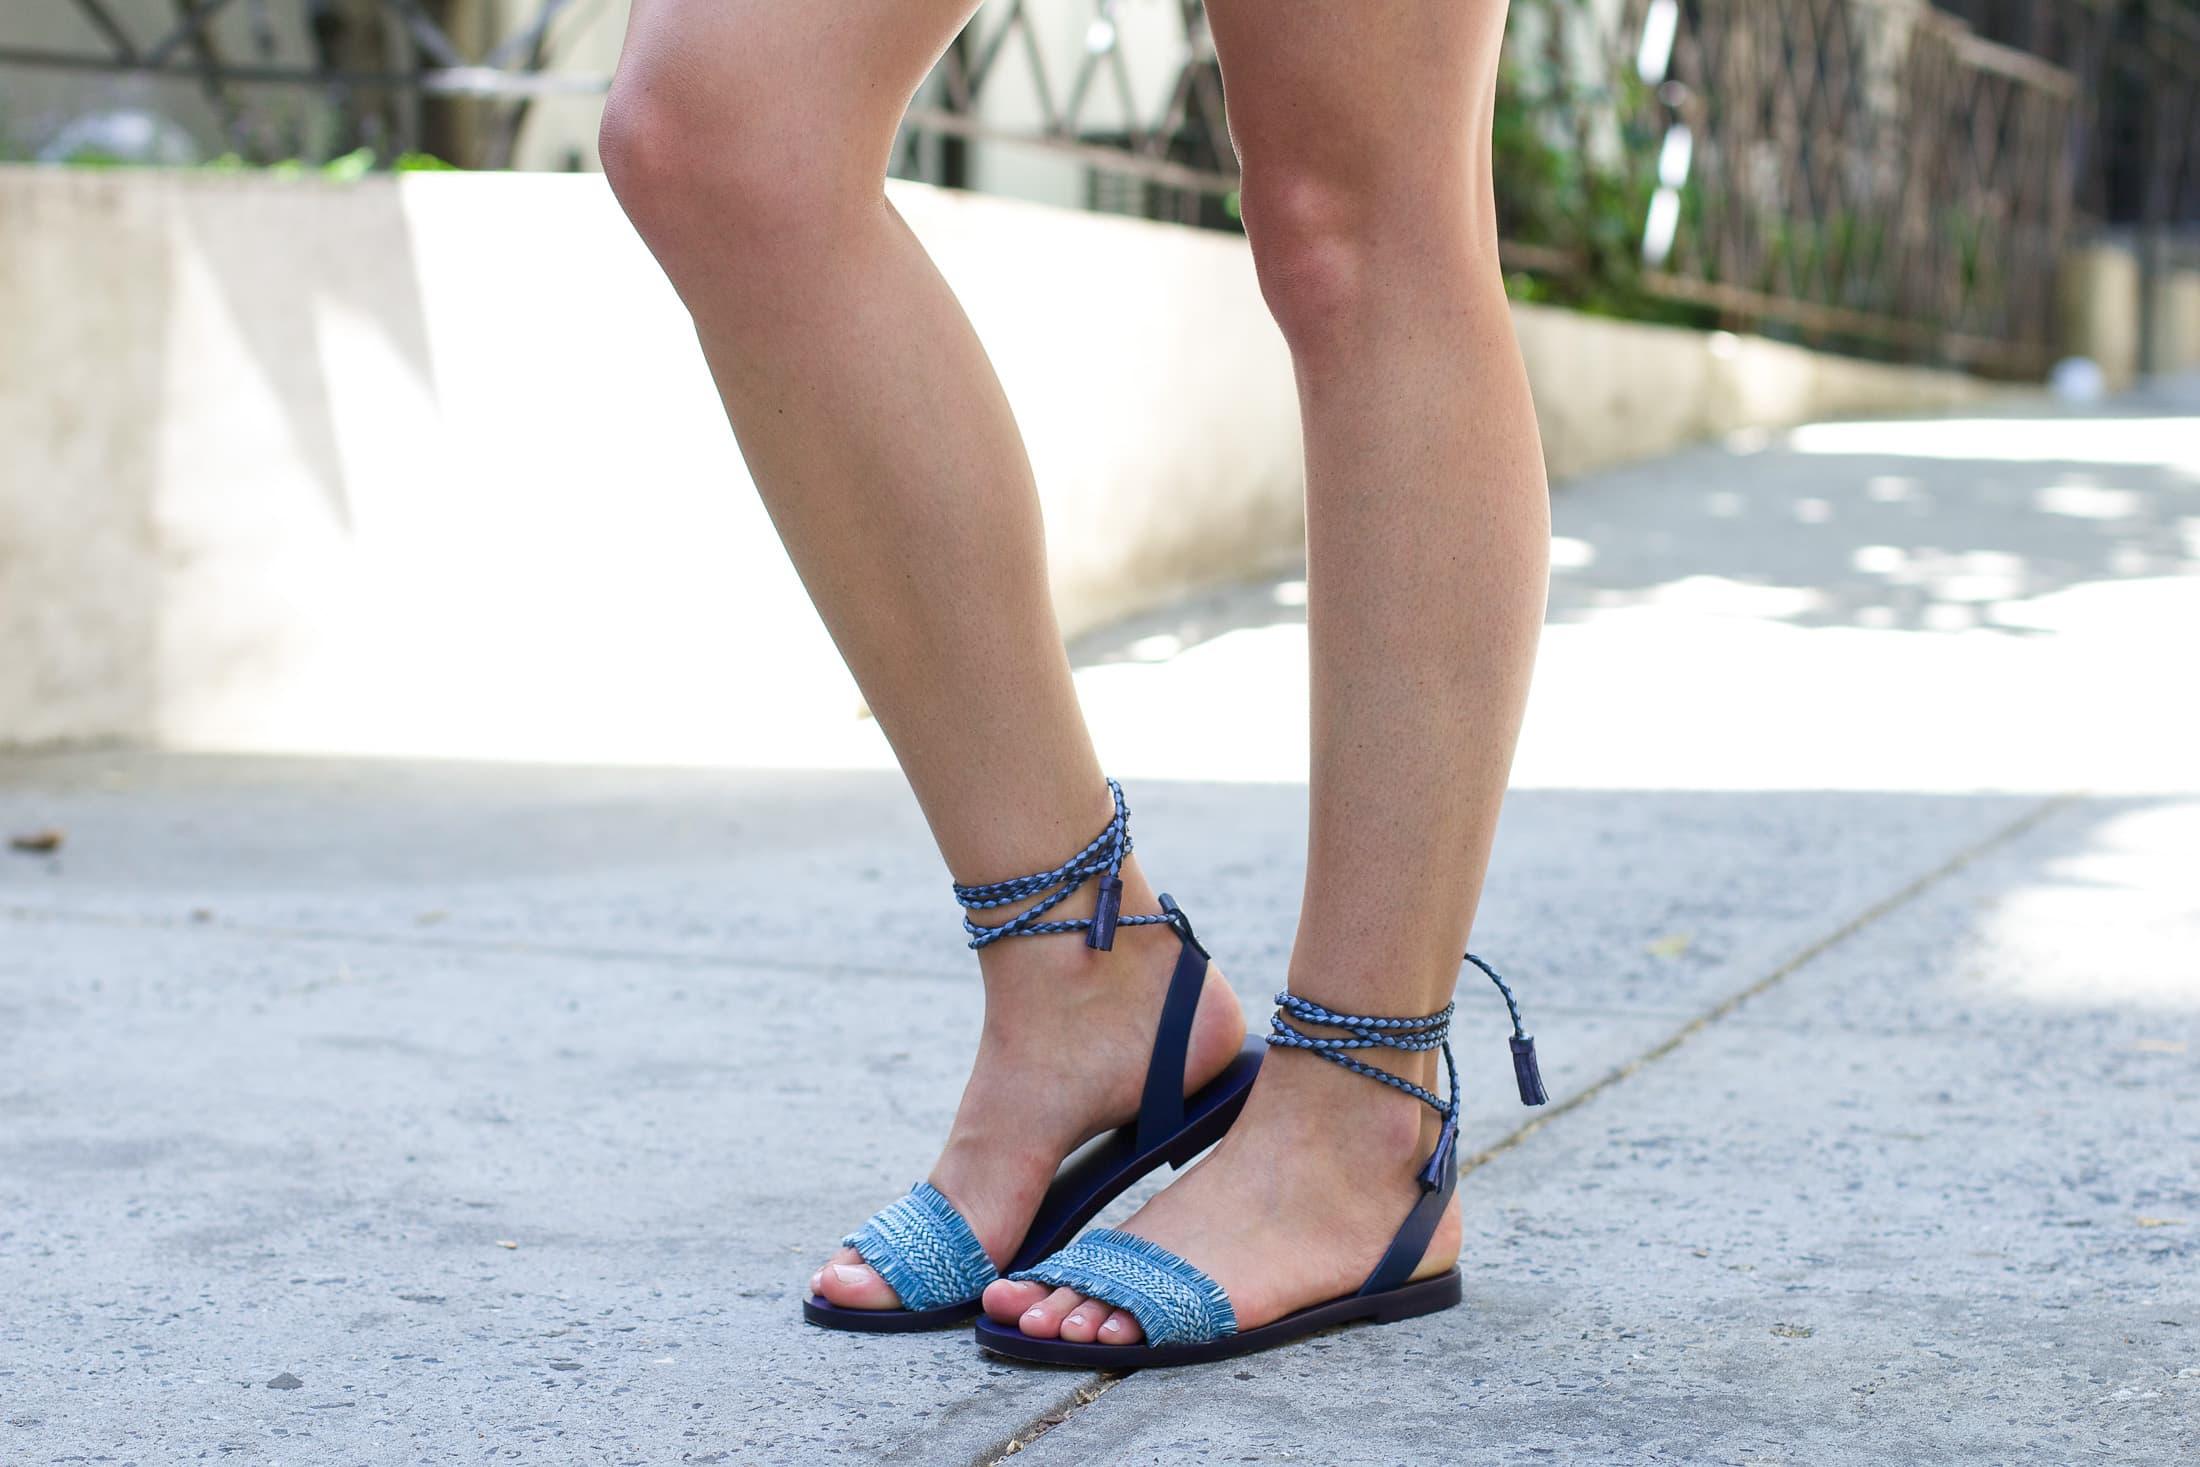 Tassel Sandals, j.crew sandals